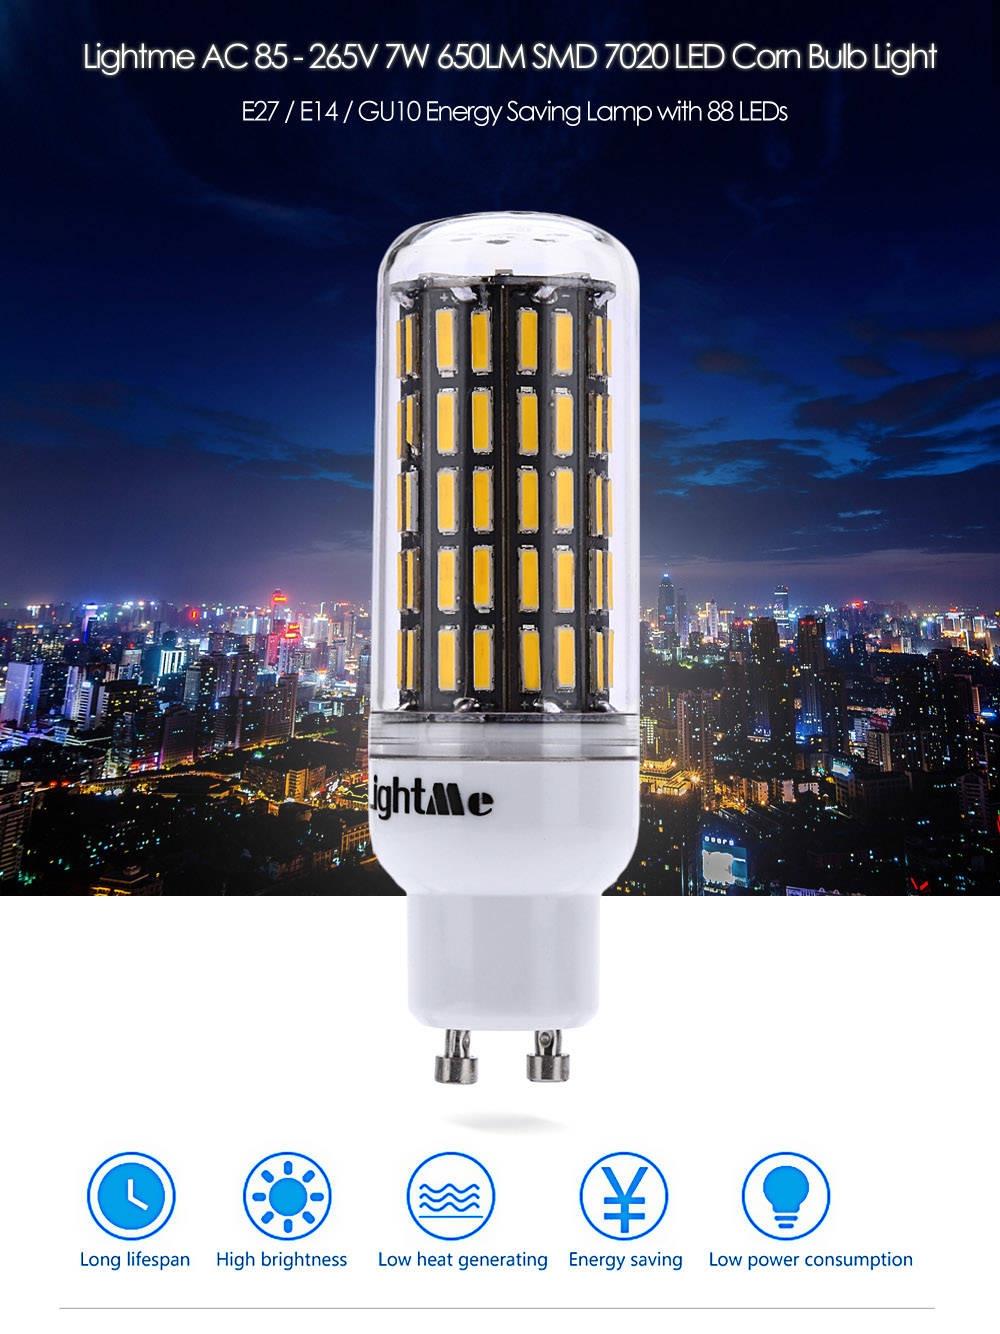 Lightme E14 AC 85 - 265V 7W 650LM SMD 7020 LED Corn Bulb Light Energy Saving Lamp with 88 LEDs